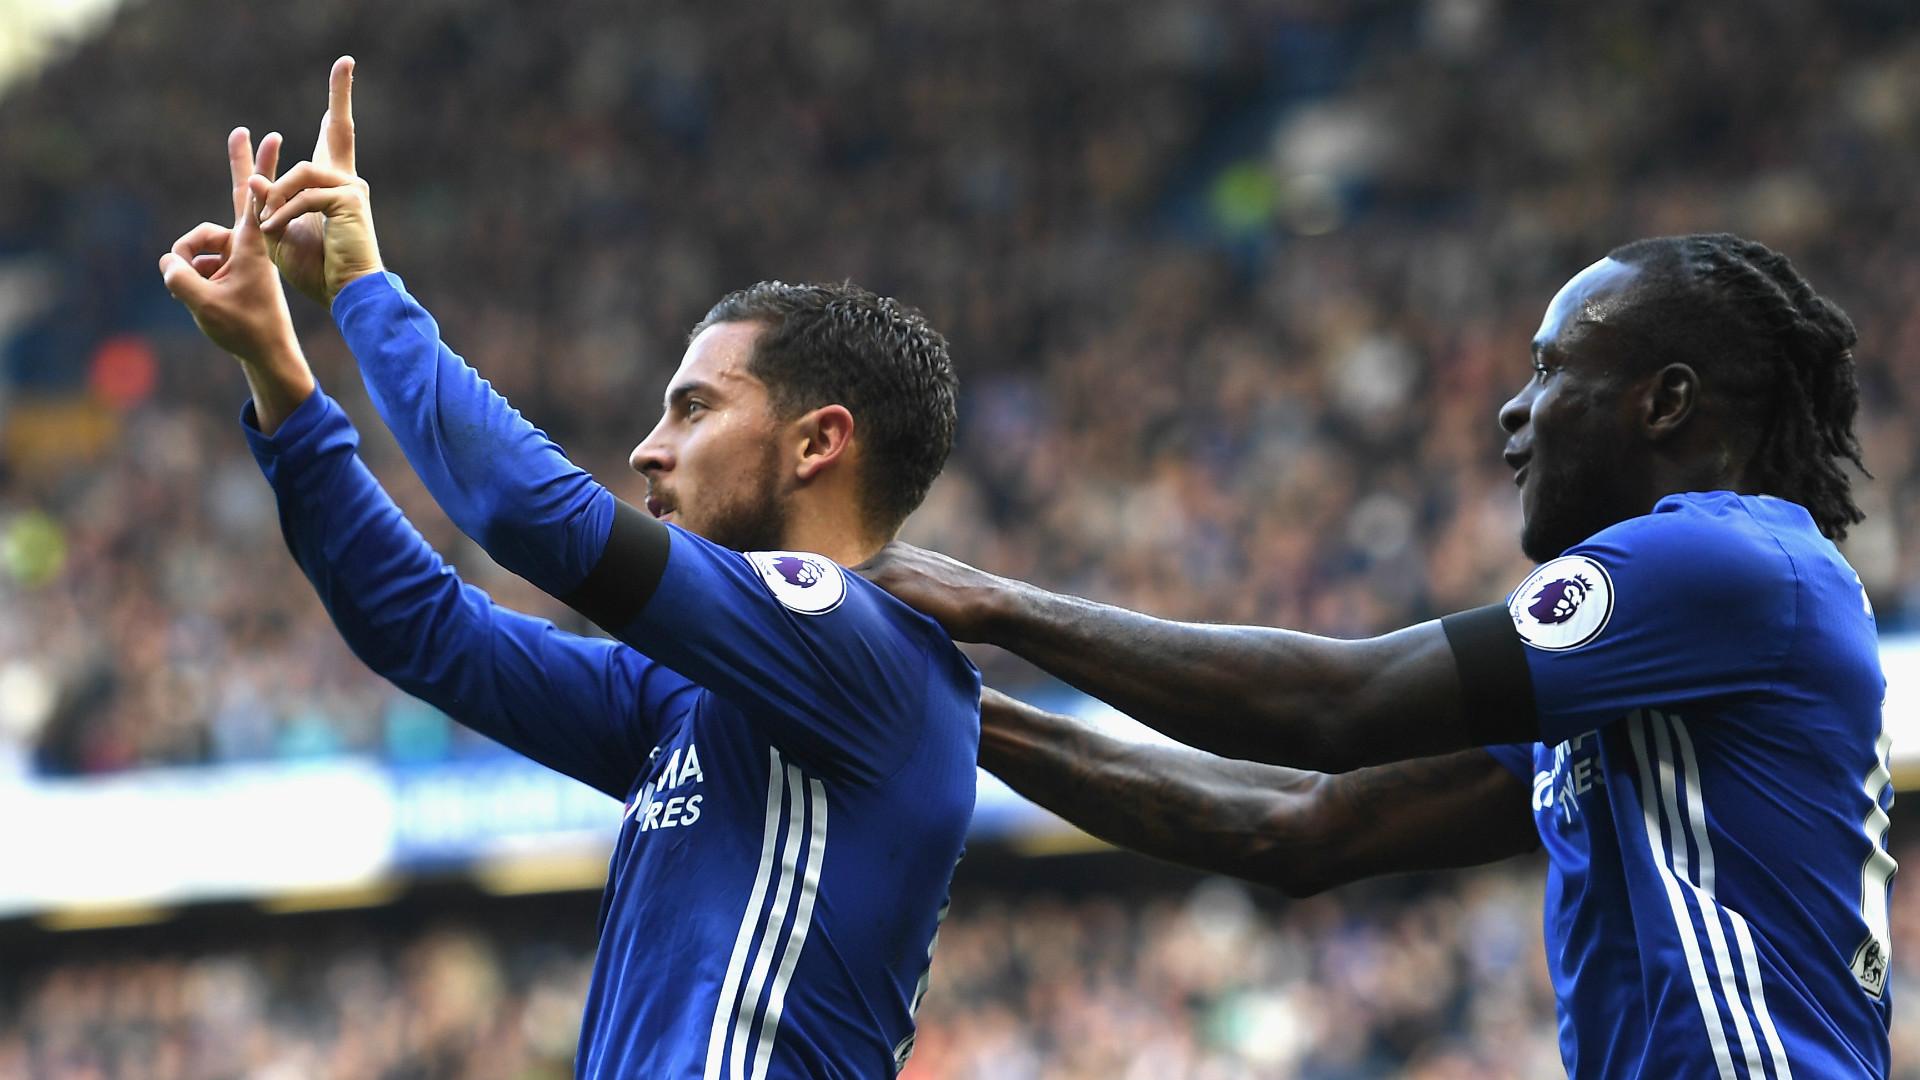 Chelsea Stars Diego Costa & Eden Hazard Dedicate Goals To